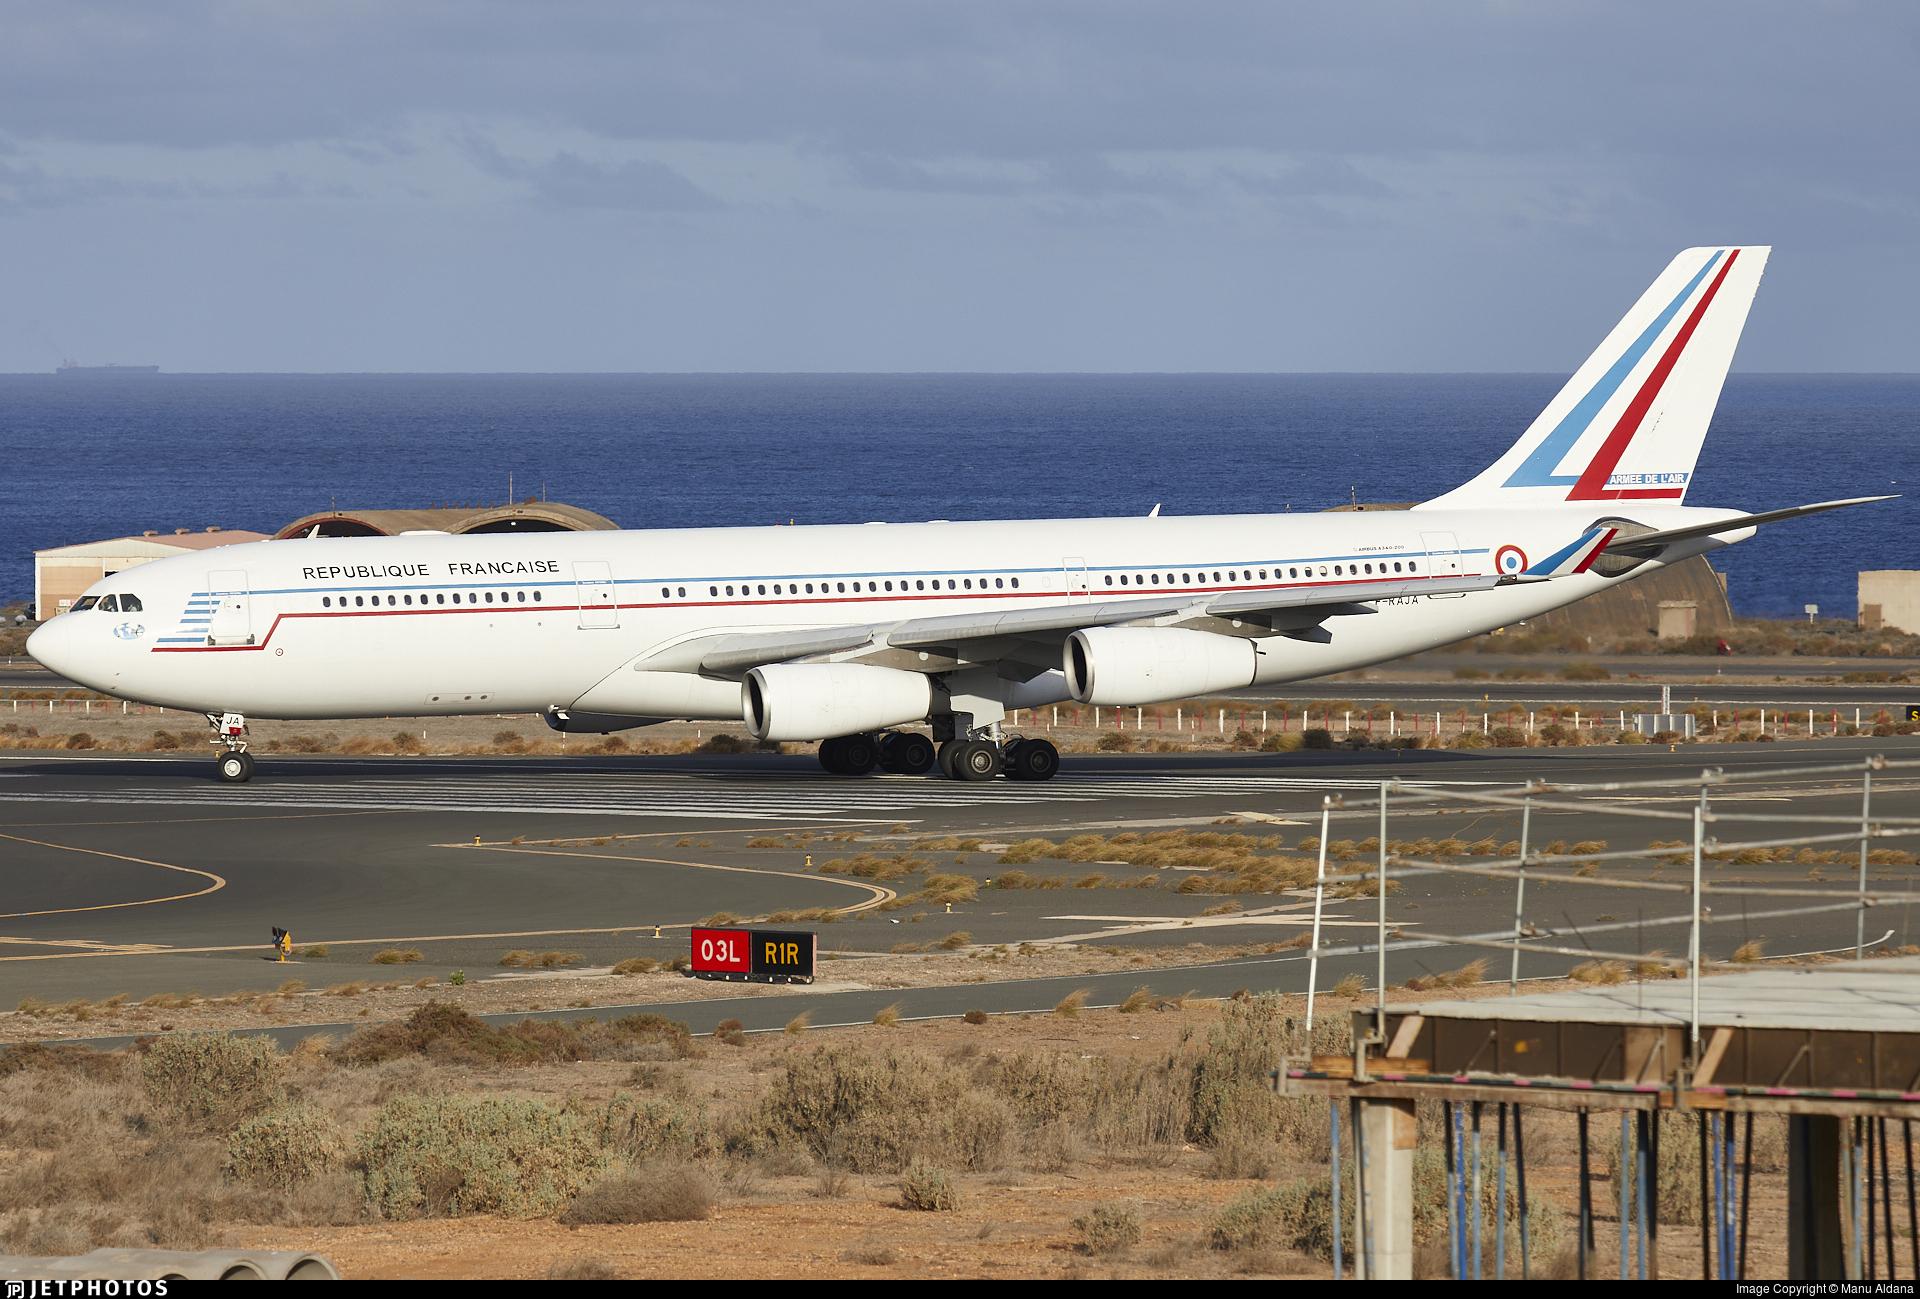 075 - Airbus A340-211 - France - Air Force